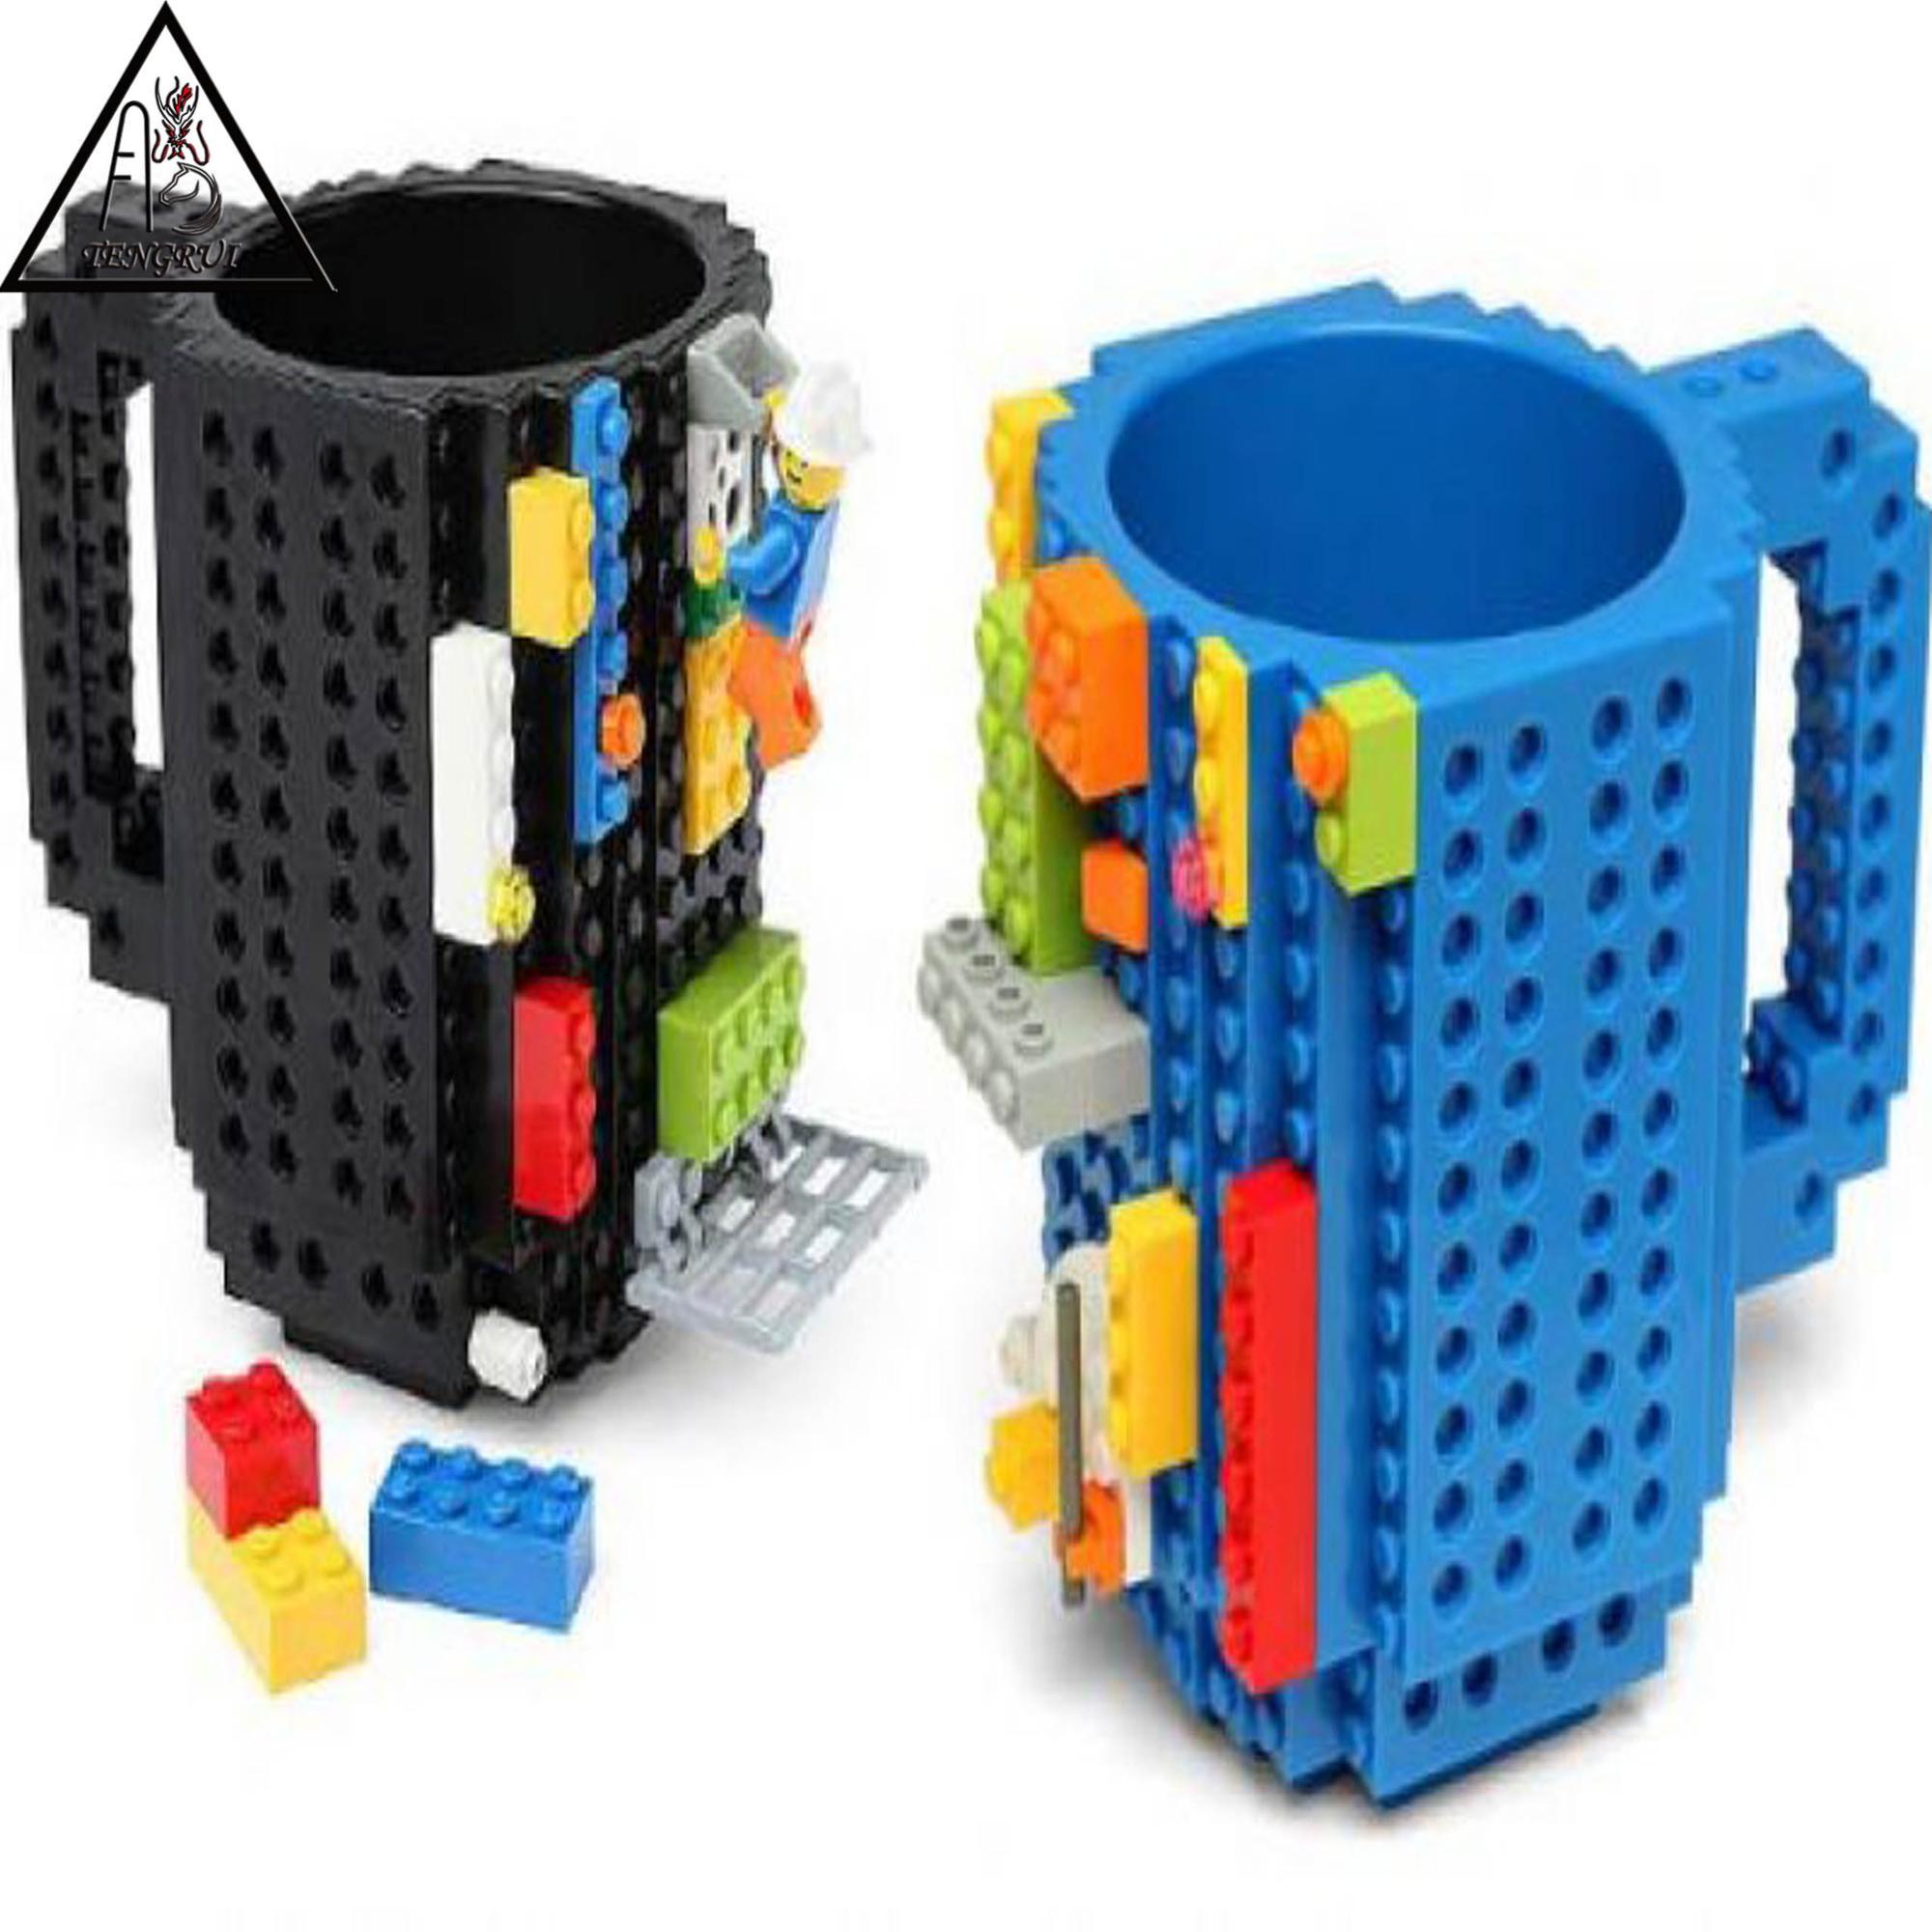 Build On Brick Mug Lego Type Creative Diy Building Blocks